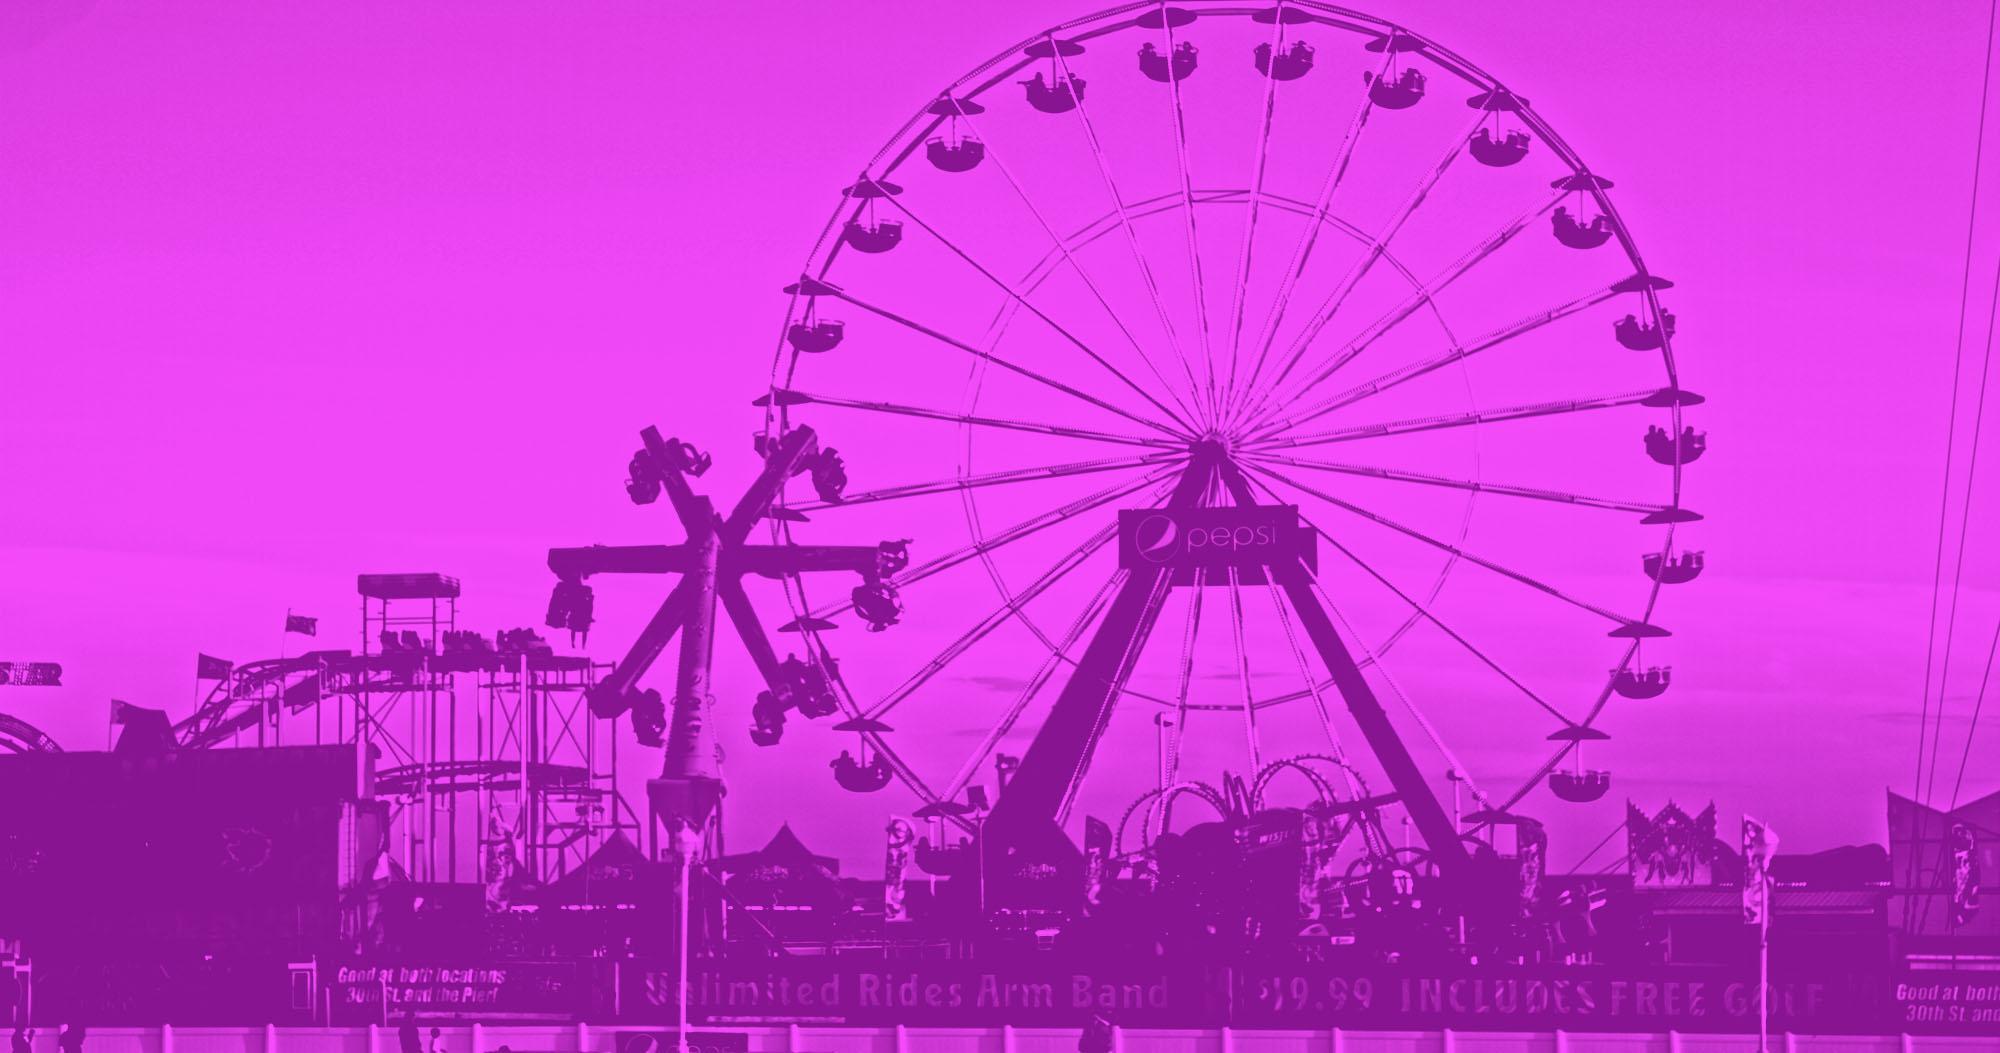 Jolly Roger at the Pier Ferris Wheel